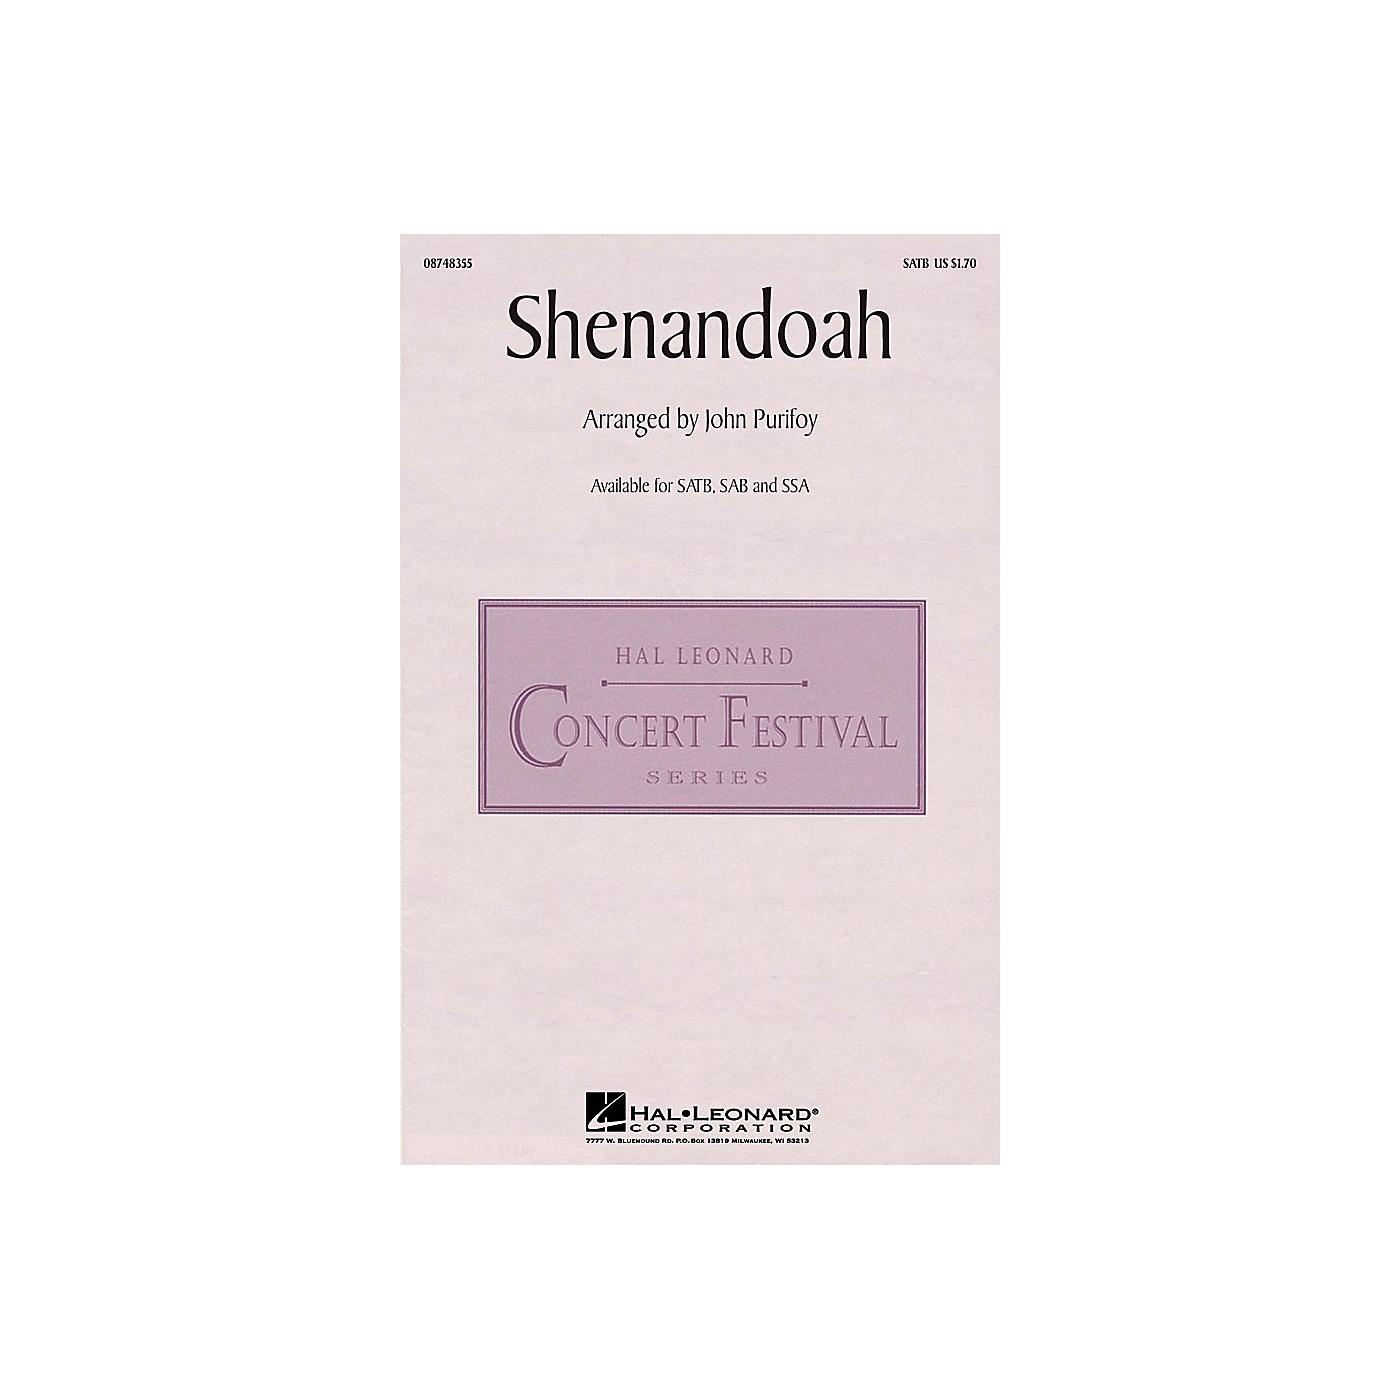 Hal Leonard Shenandoah SATB arranged by John Purifoy thumbnail